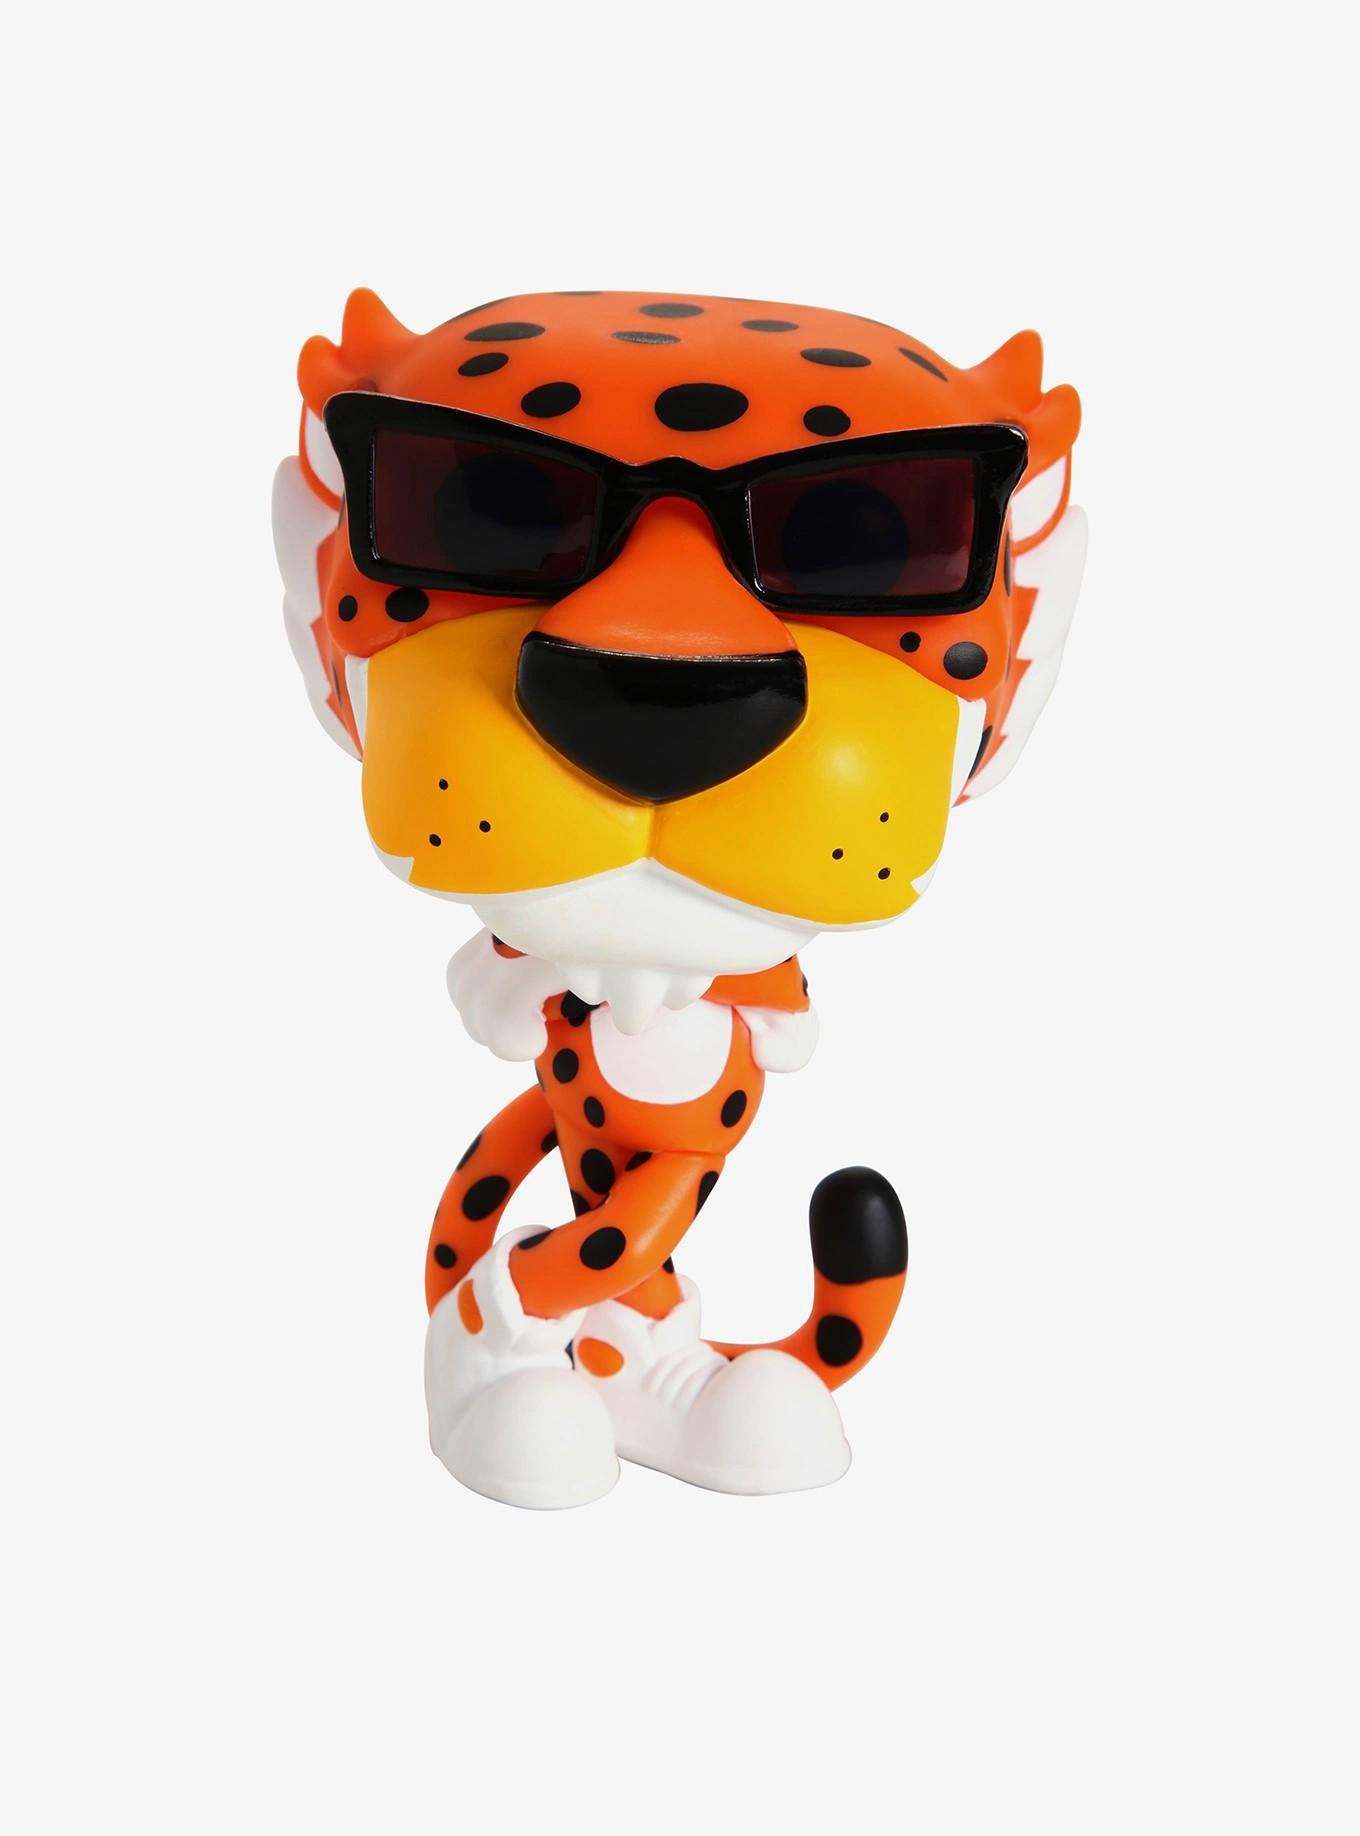 Chester Cheetah #77 - Cheetos - Funko Pop! Ad Icons